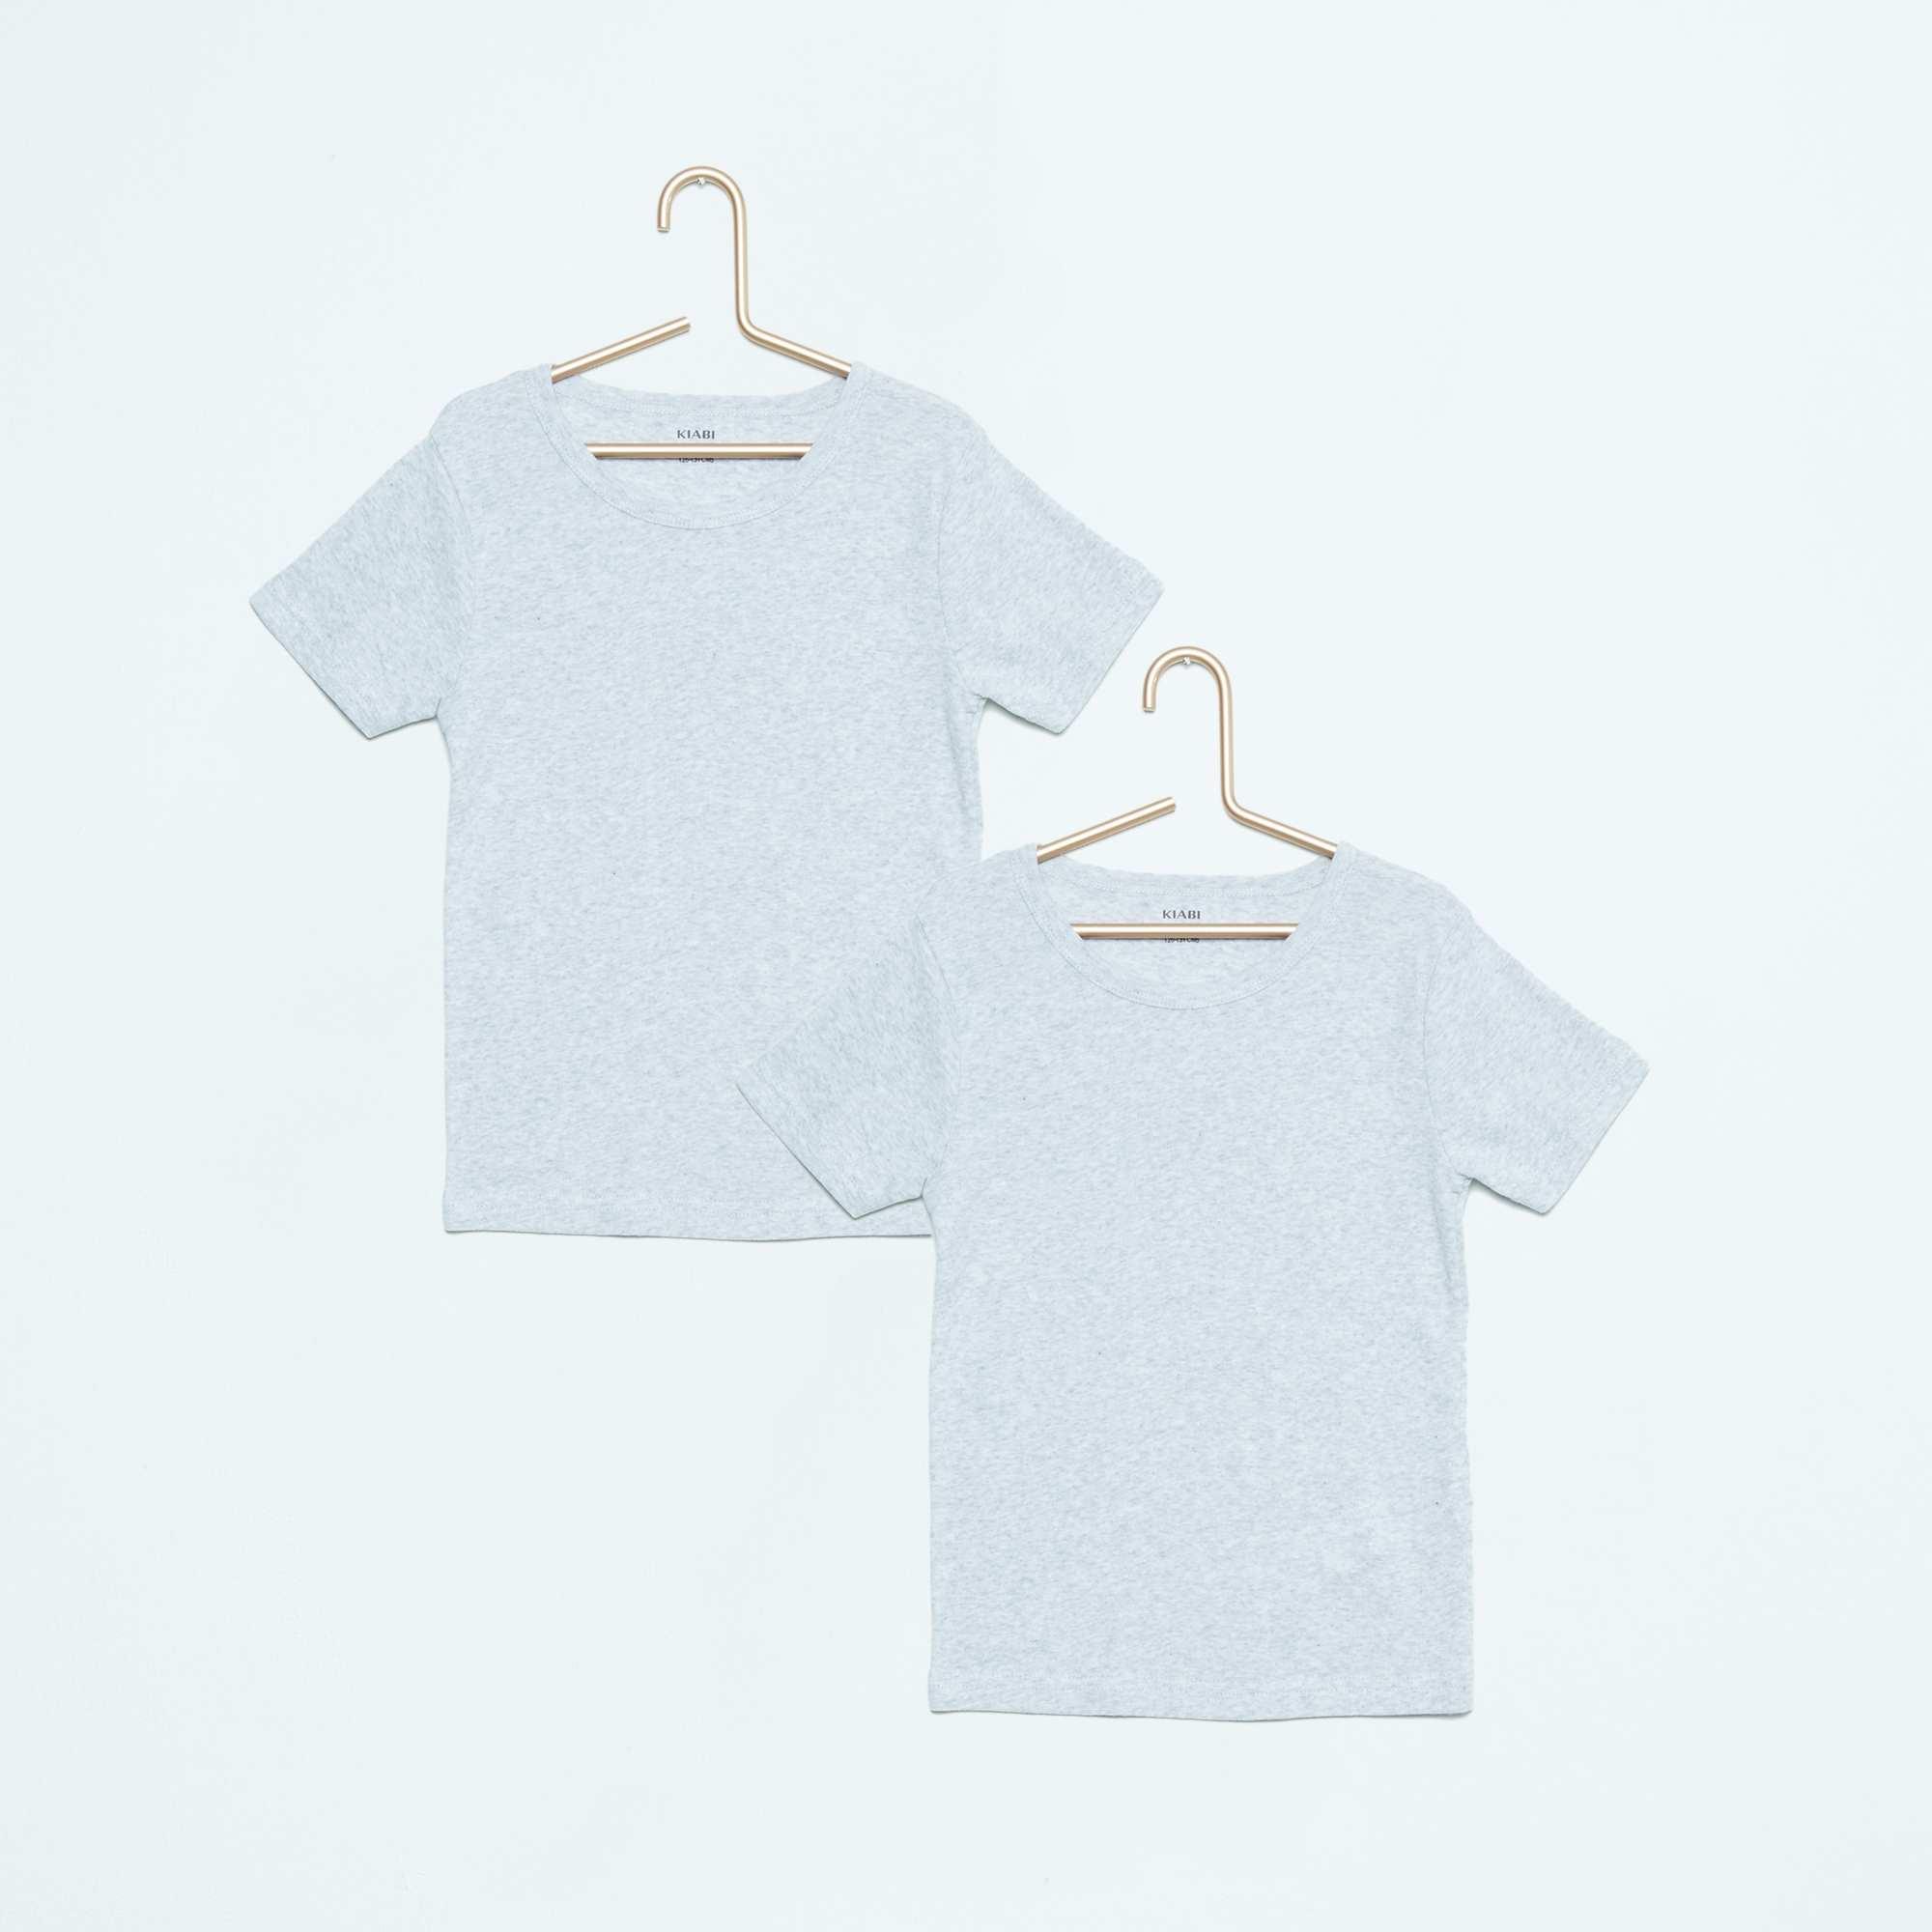 lot de 2 tee shirt coton fille gris kiabi 7 00. Black Bedroom Furniture Sets. Home Design Ideas